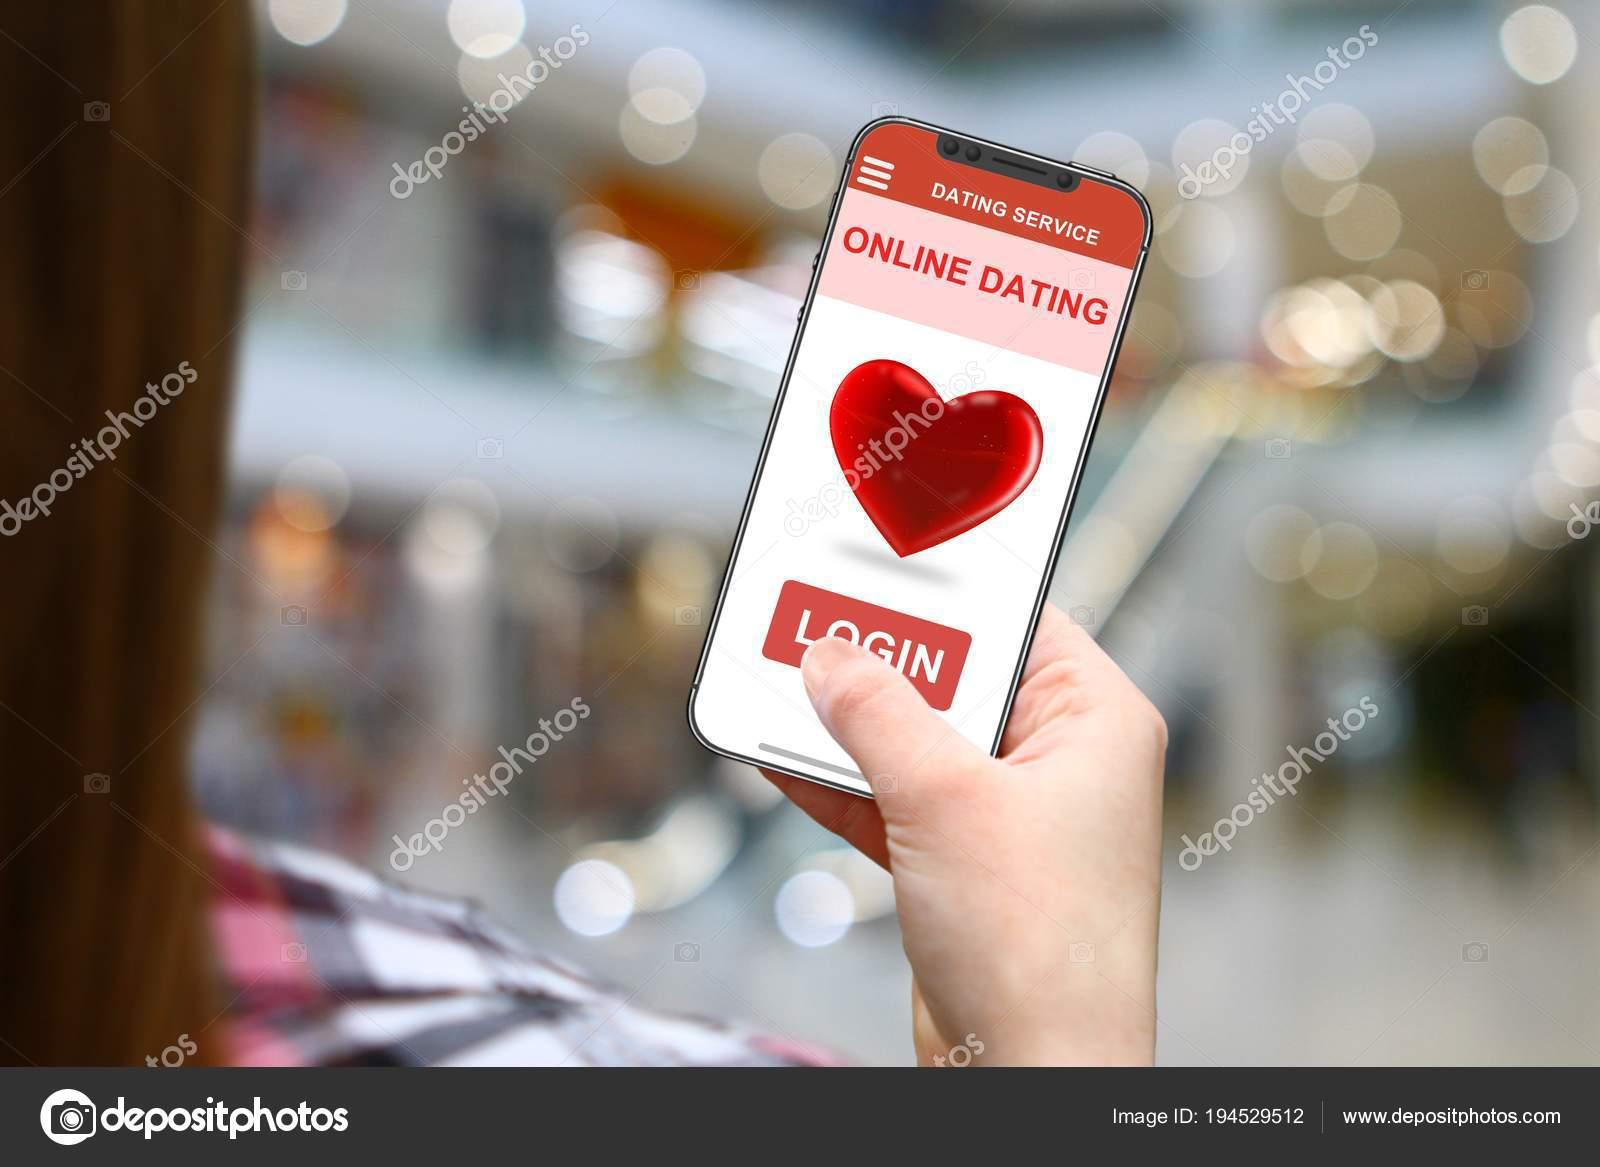 Säker dating Place Dhaka